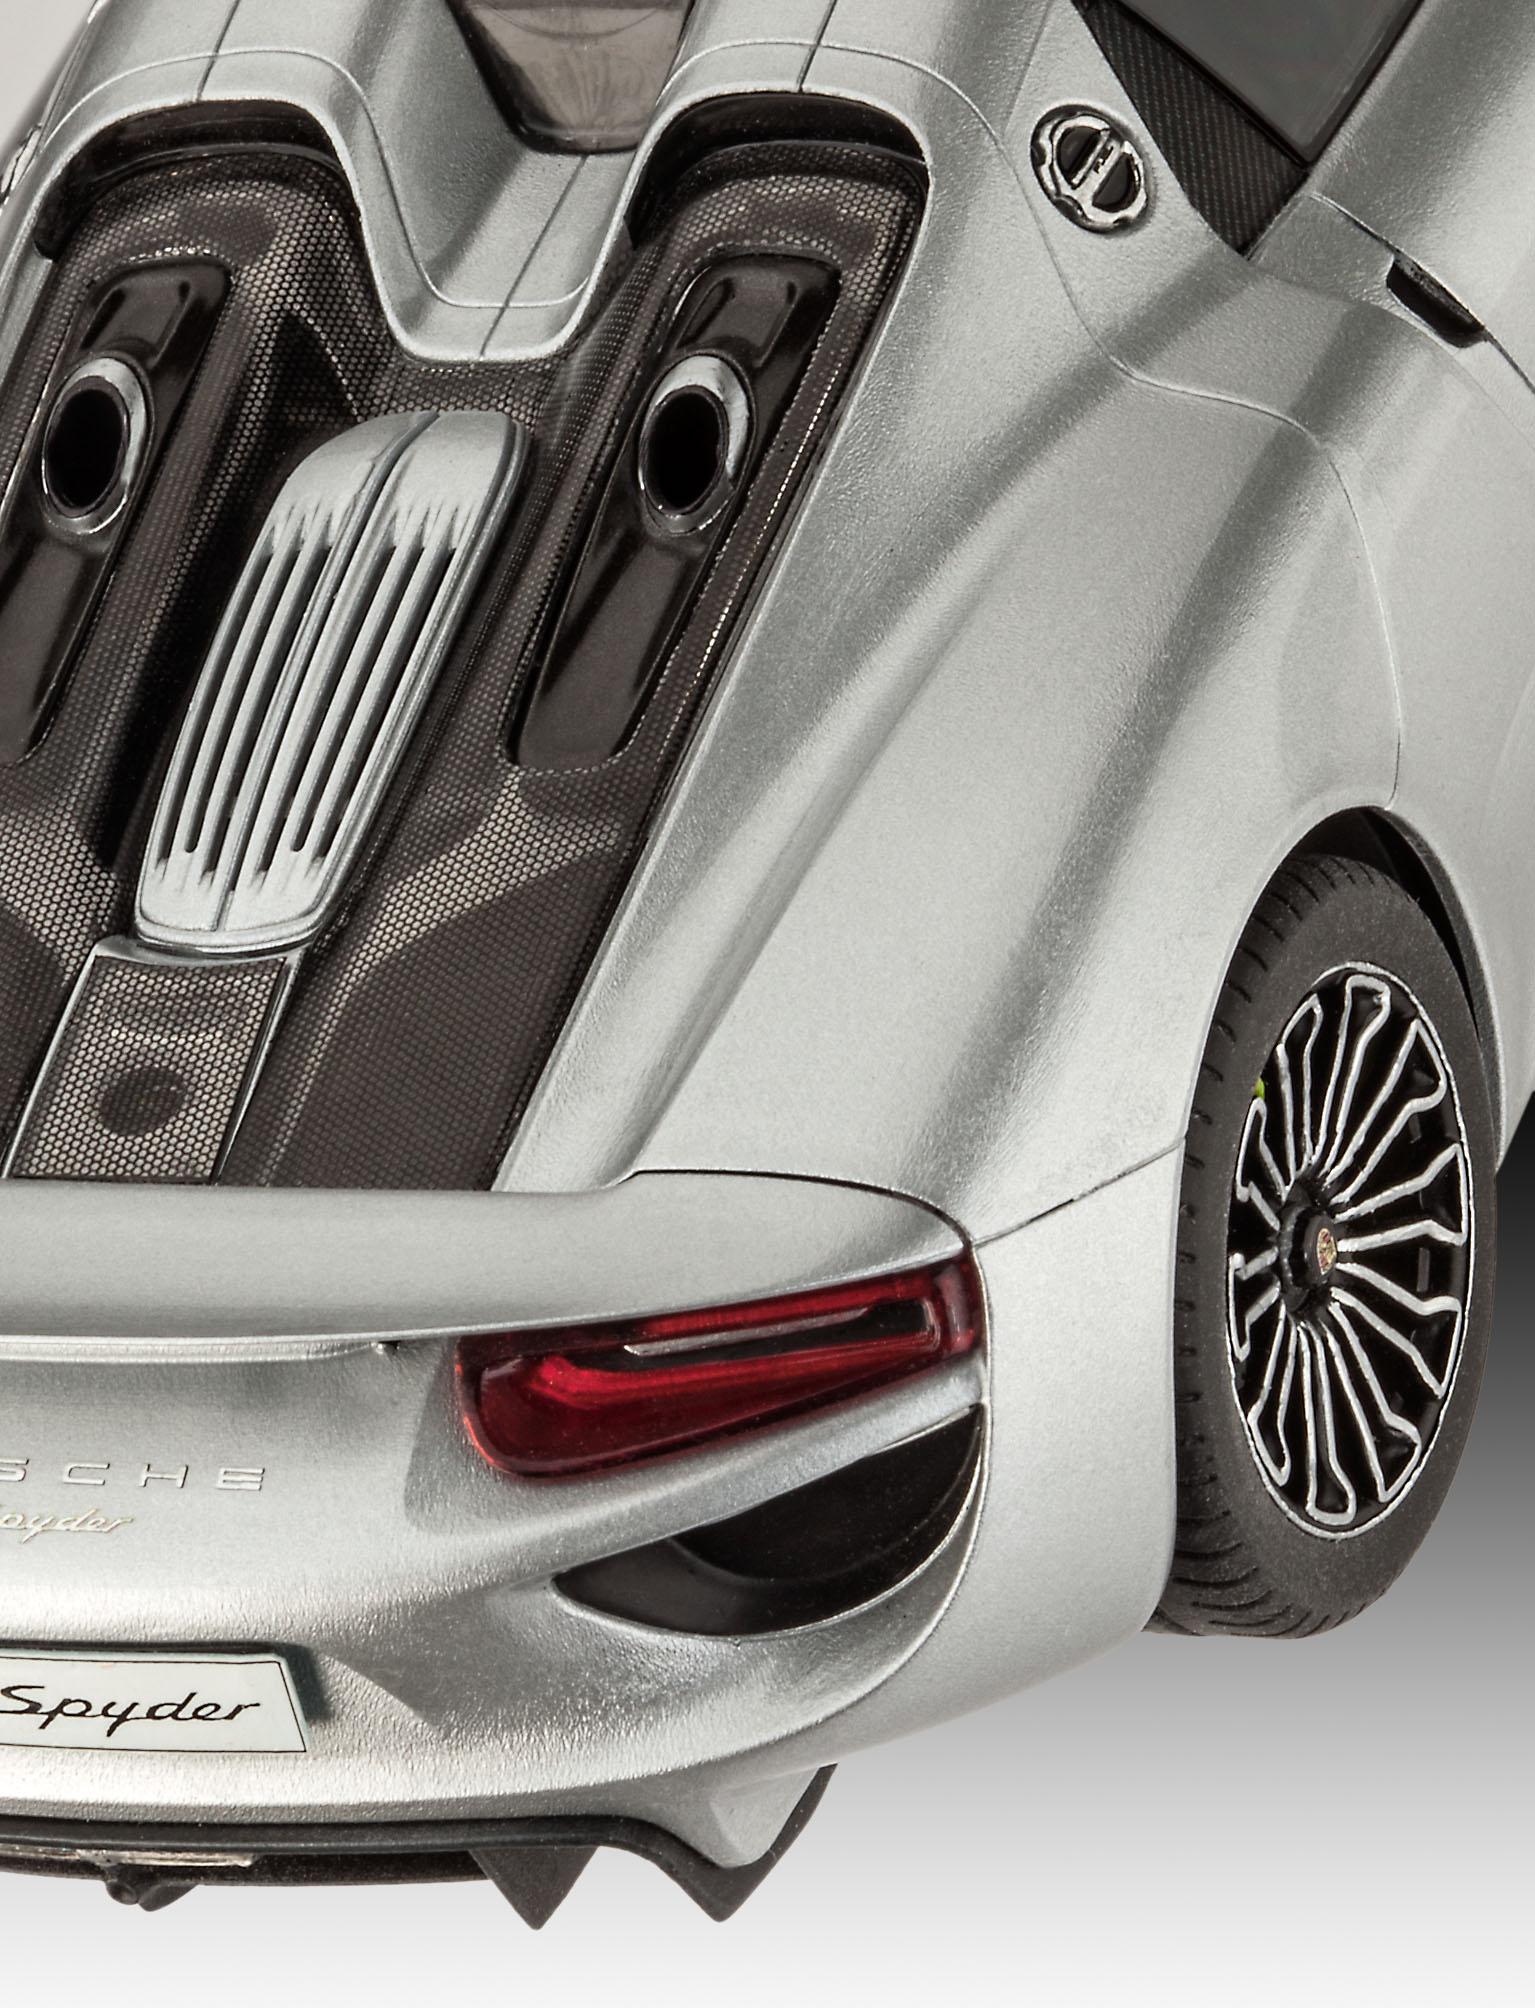 Revell Shop | Model Set Porsche 918 Spyder | Revell Shop